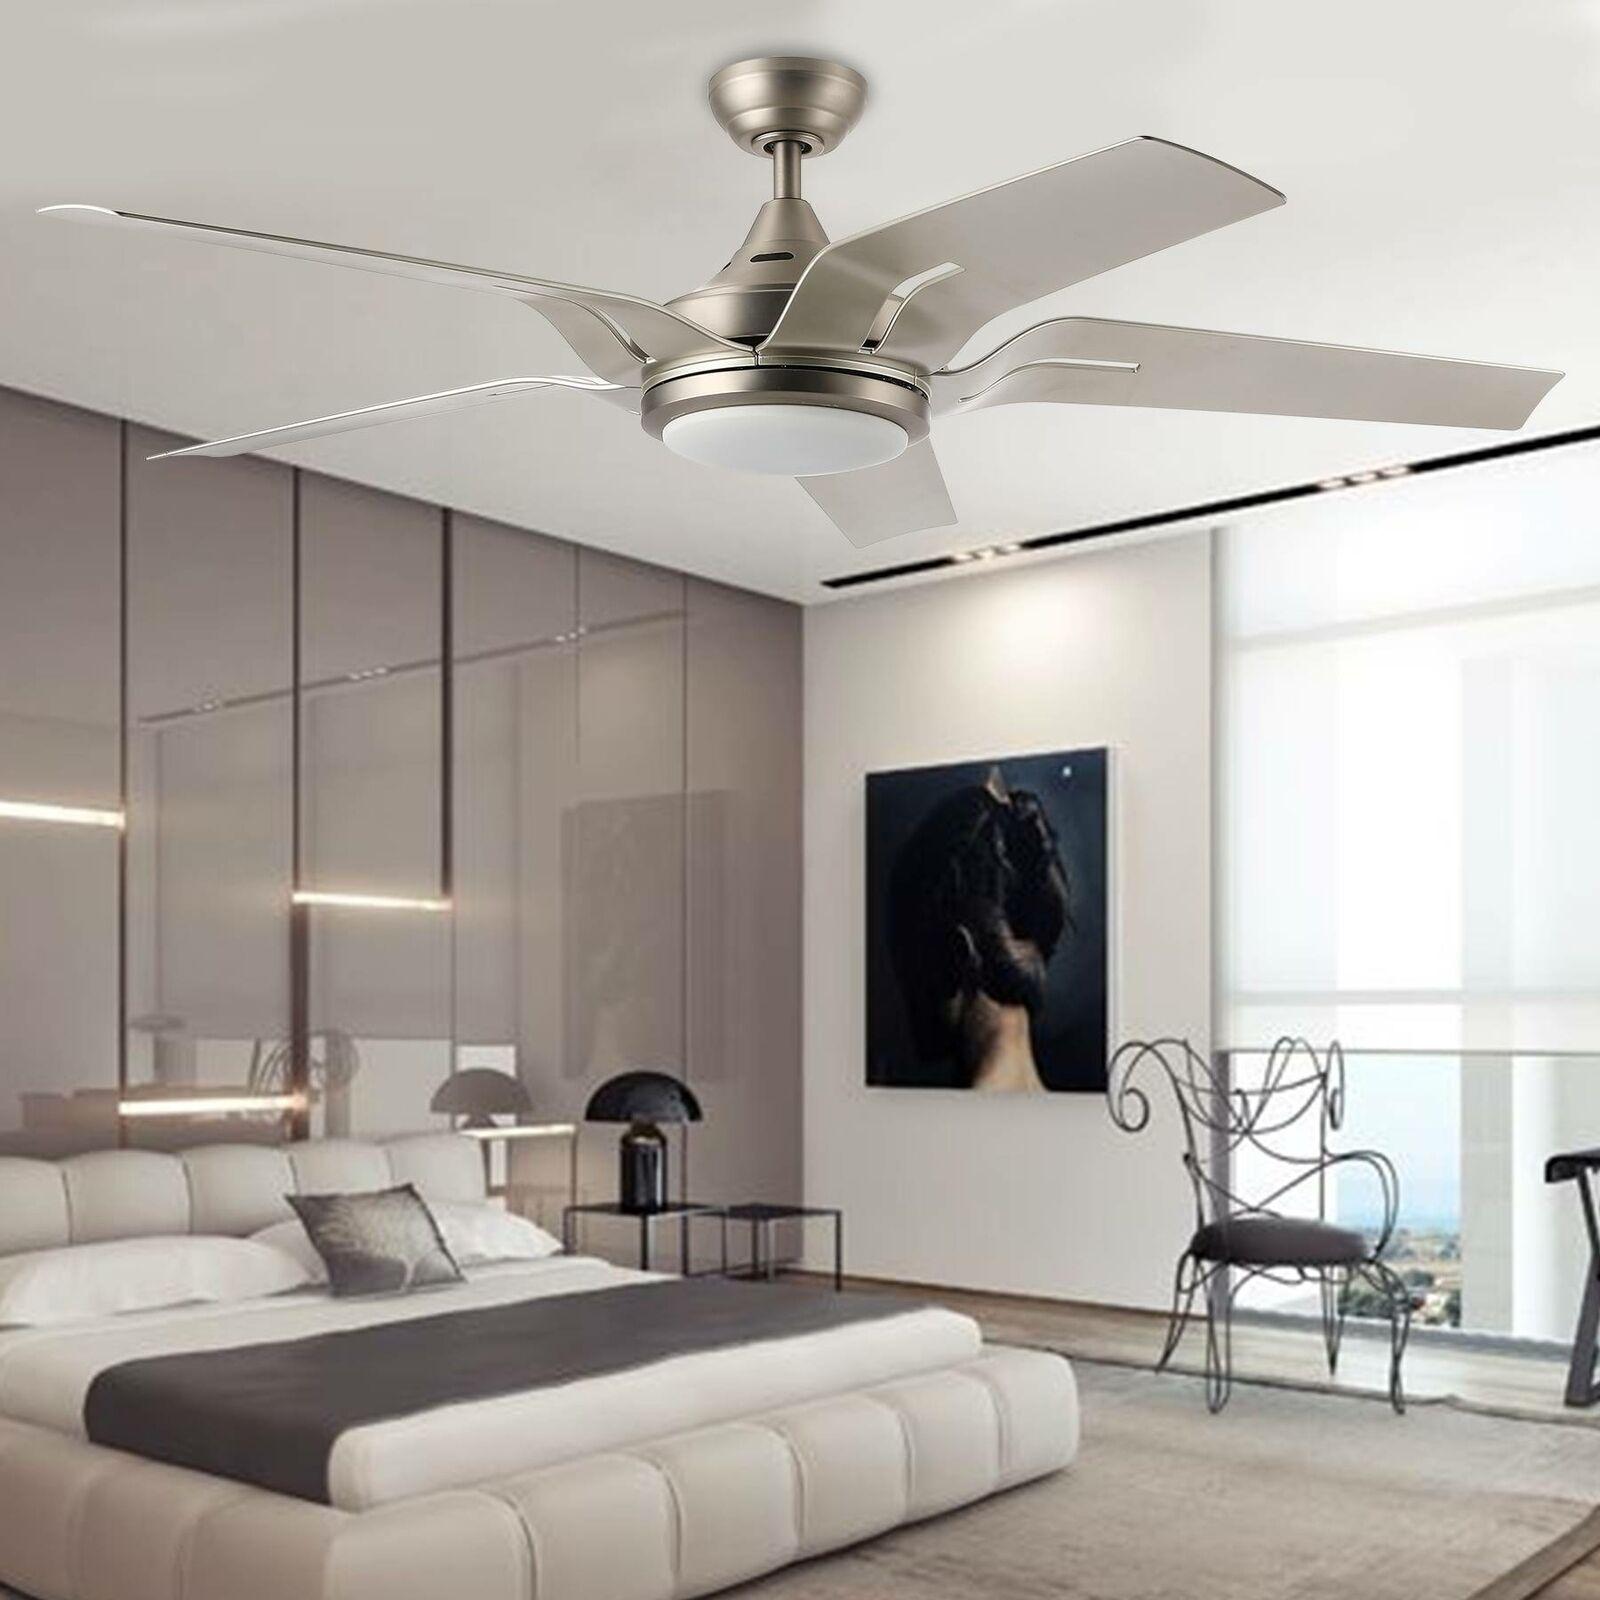 56 Modern Ceiling Fan 5 Blade Reversible Silver Steel Led Light Remote Control For Sale Online